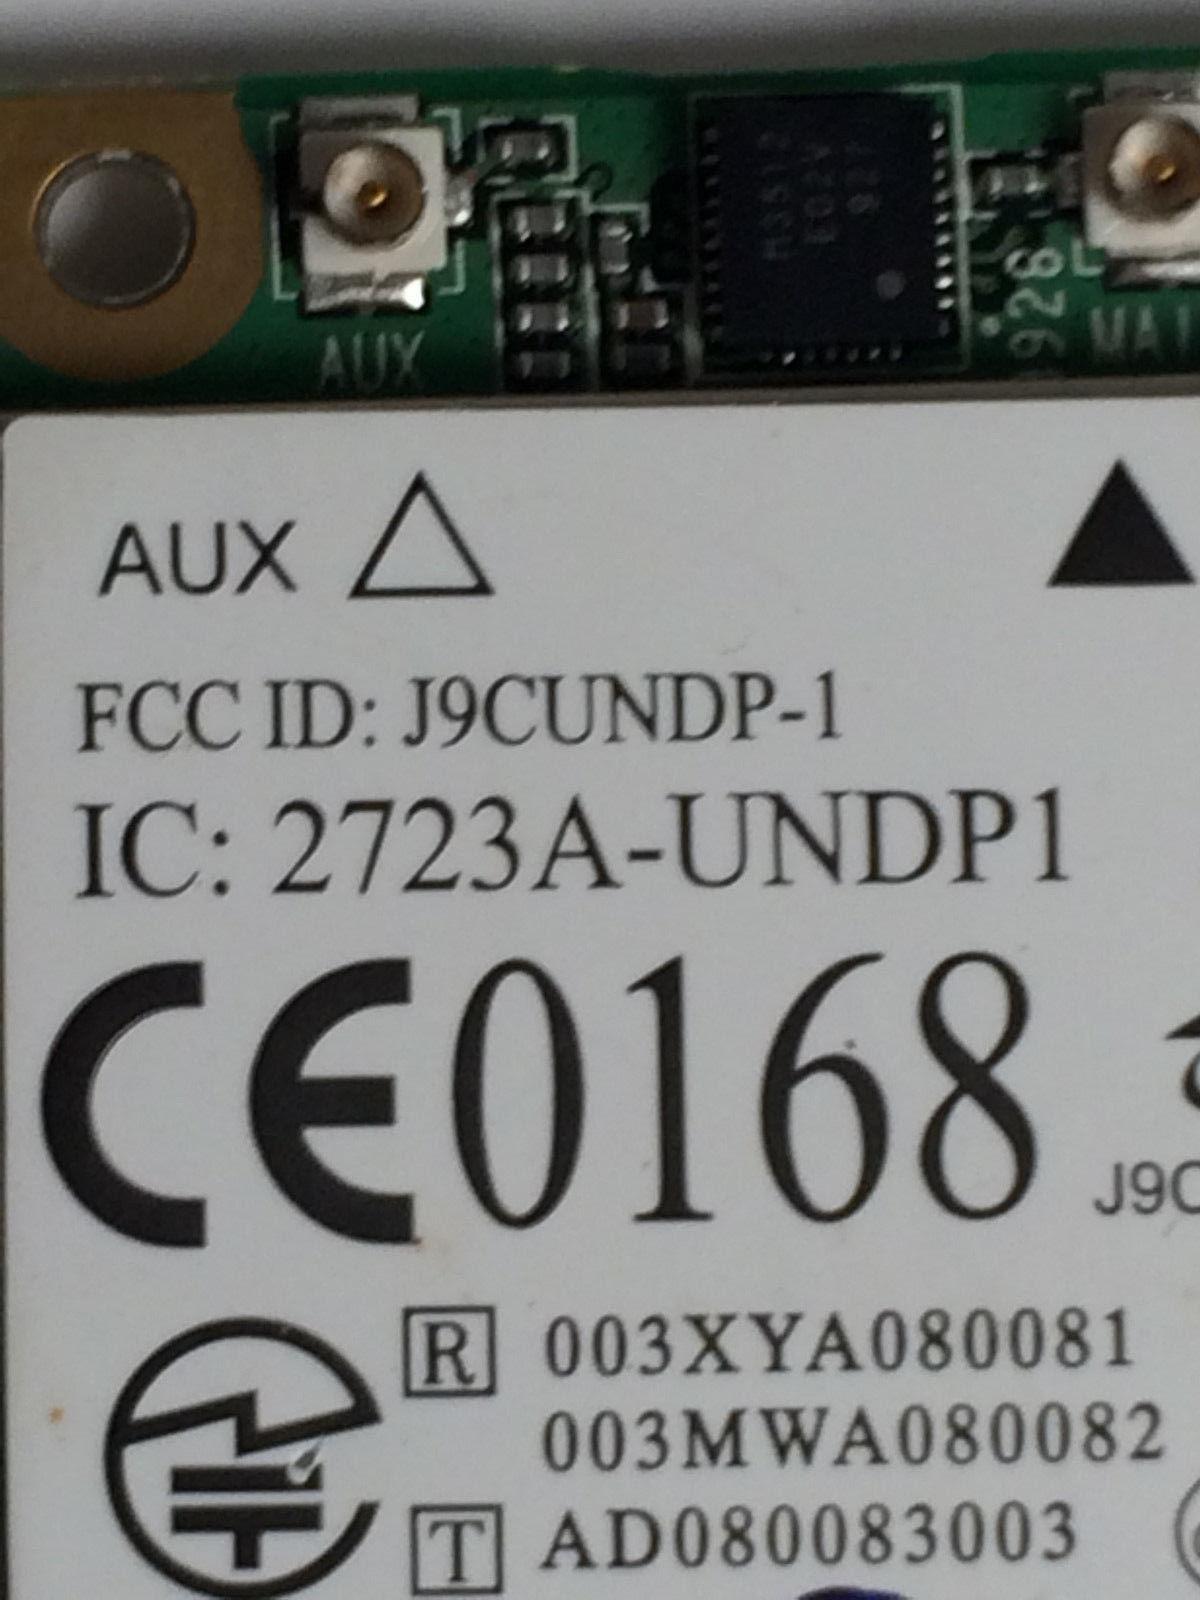 Qualcomm J9CUNDP-1 Broadband WWAN Mobile Wireless Mini PCI-E Card T77Z039.18 LF image 4